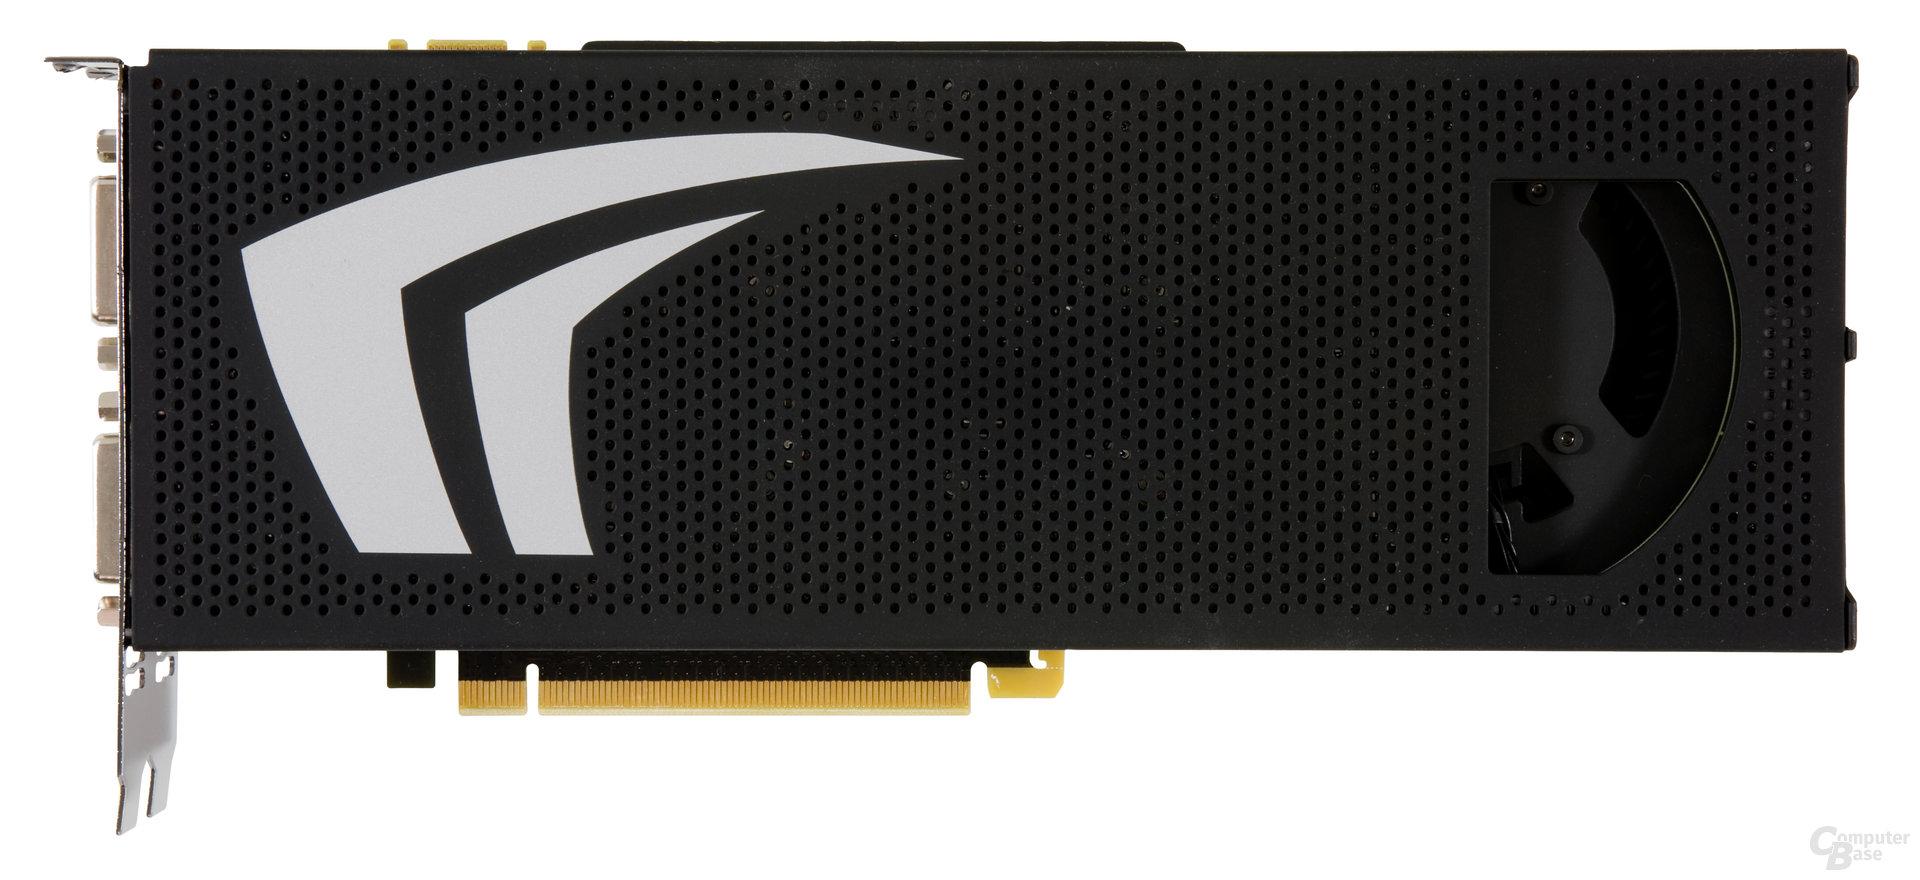 Nvidia GeForce GTX 295